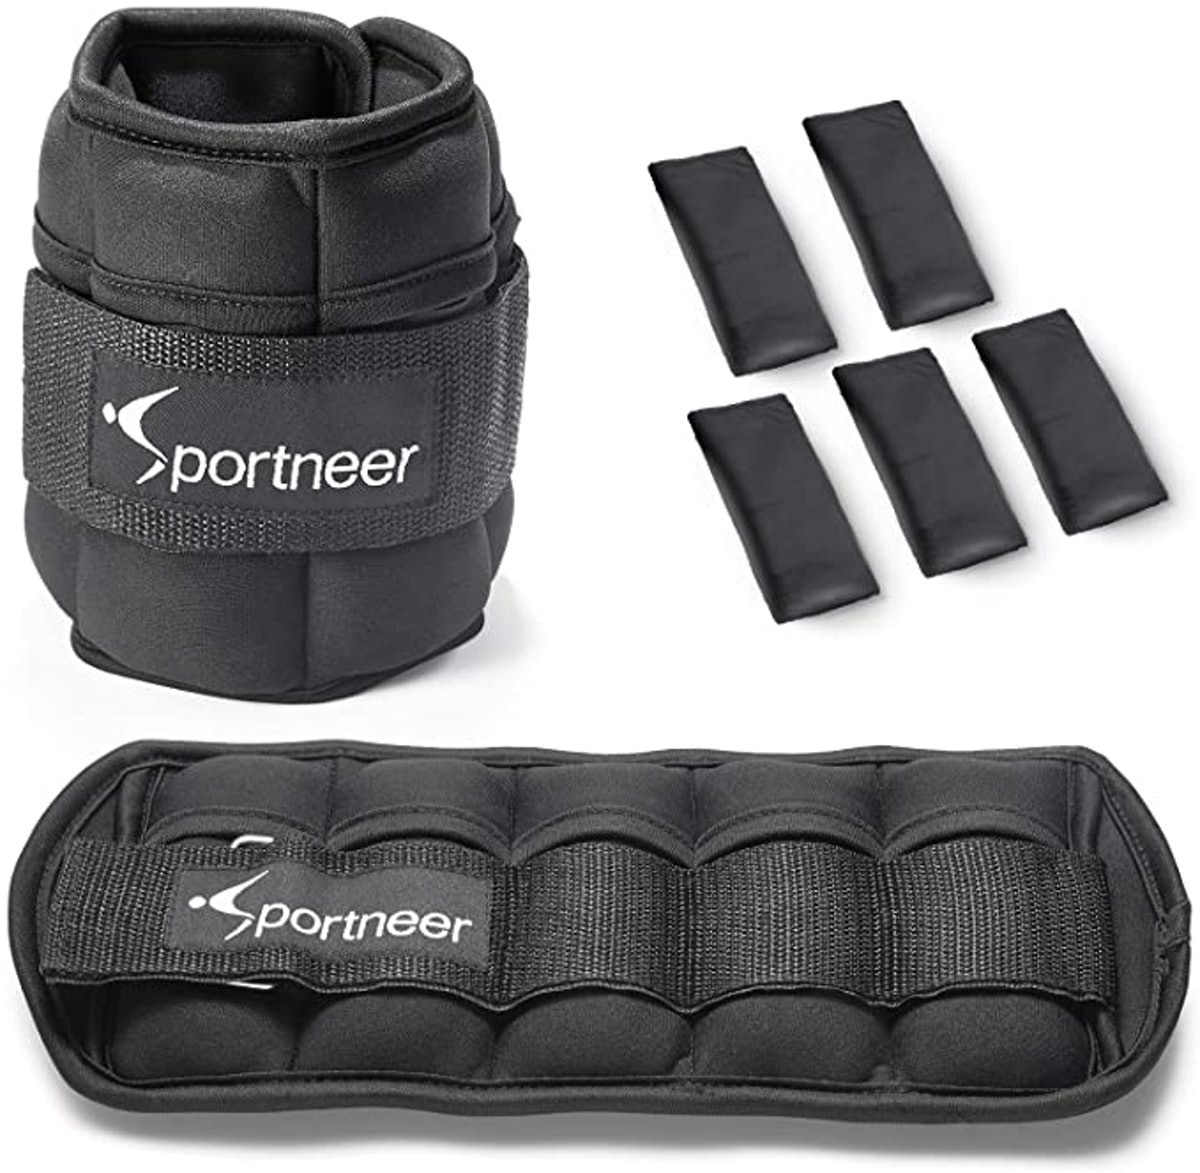 Sportneer Adjustable Ankle Weights